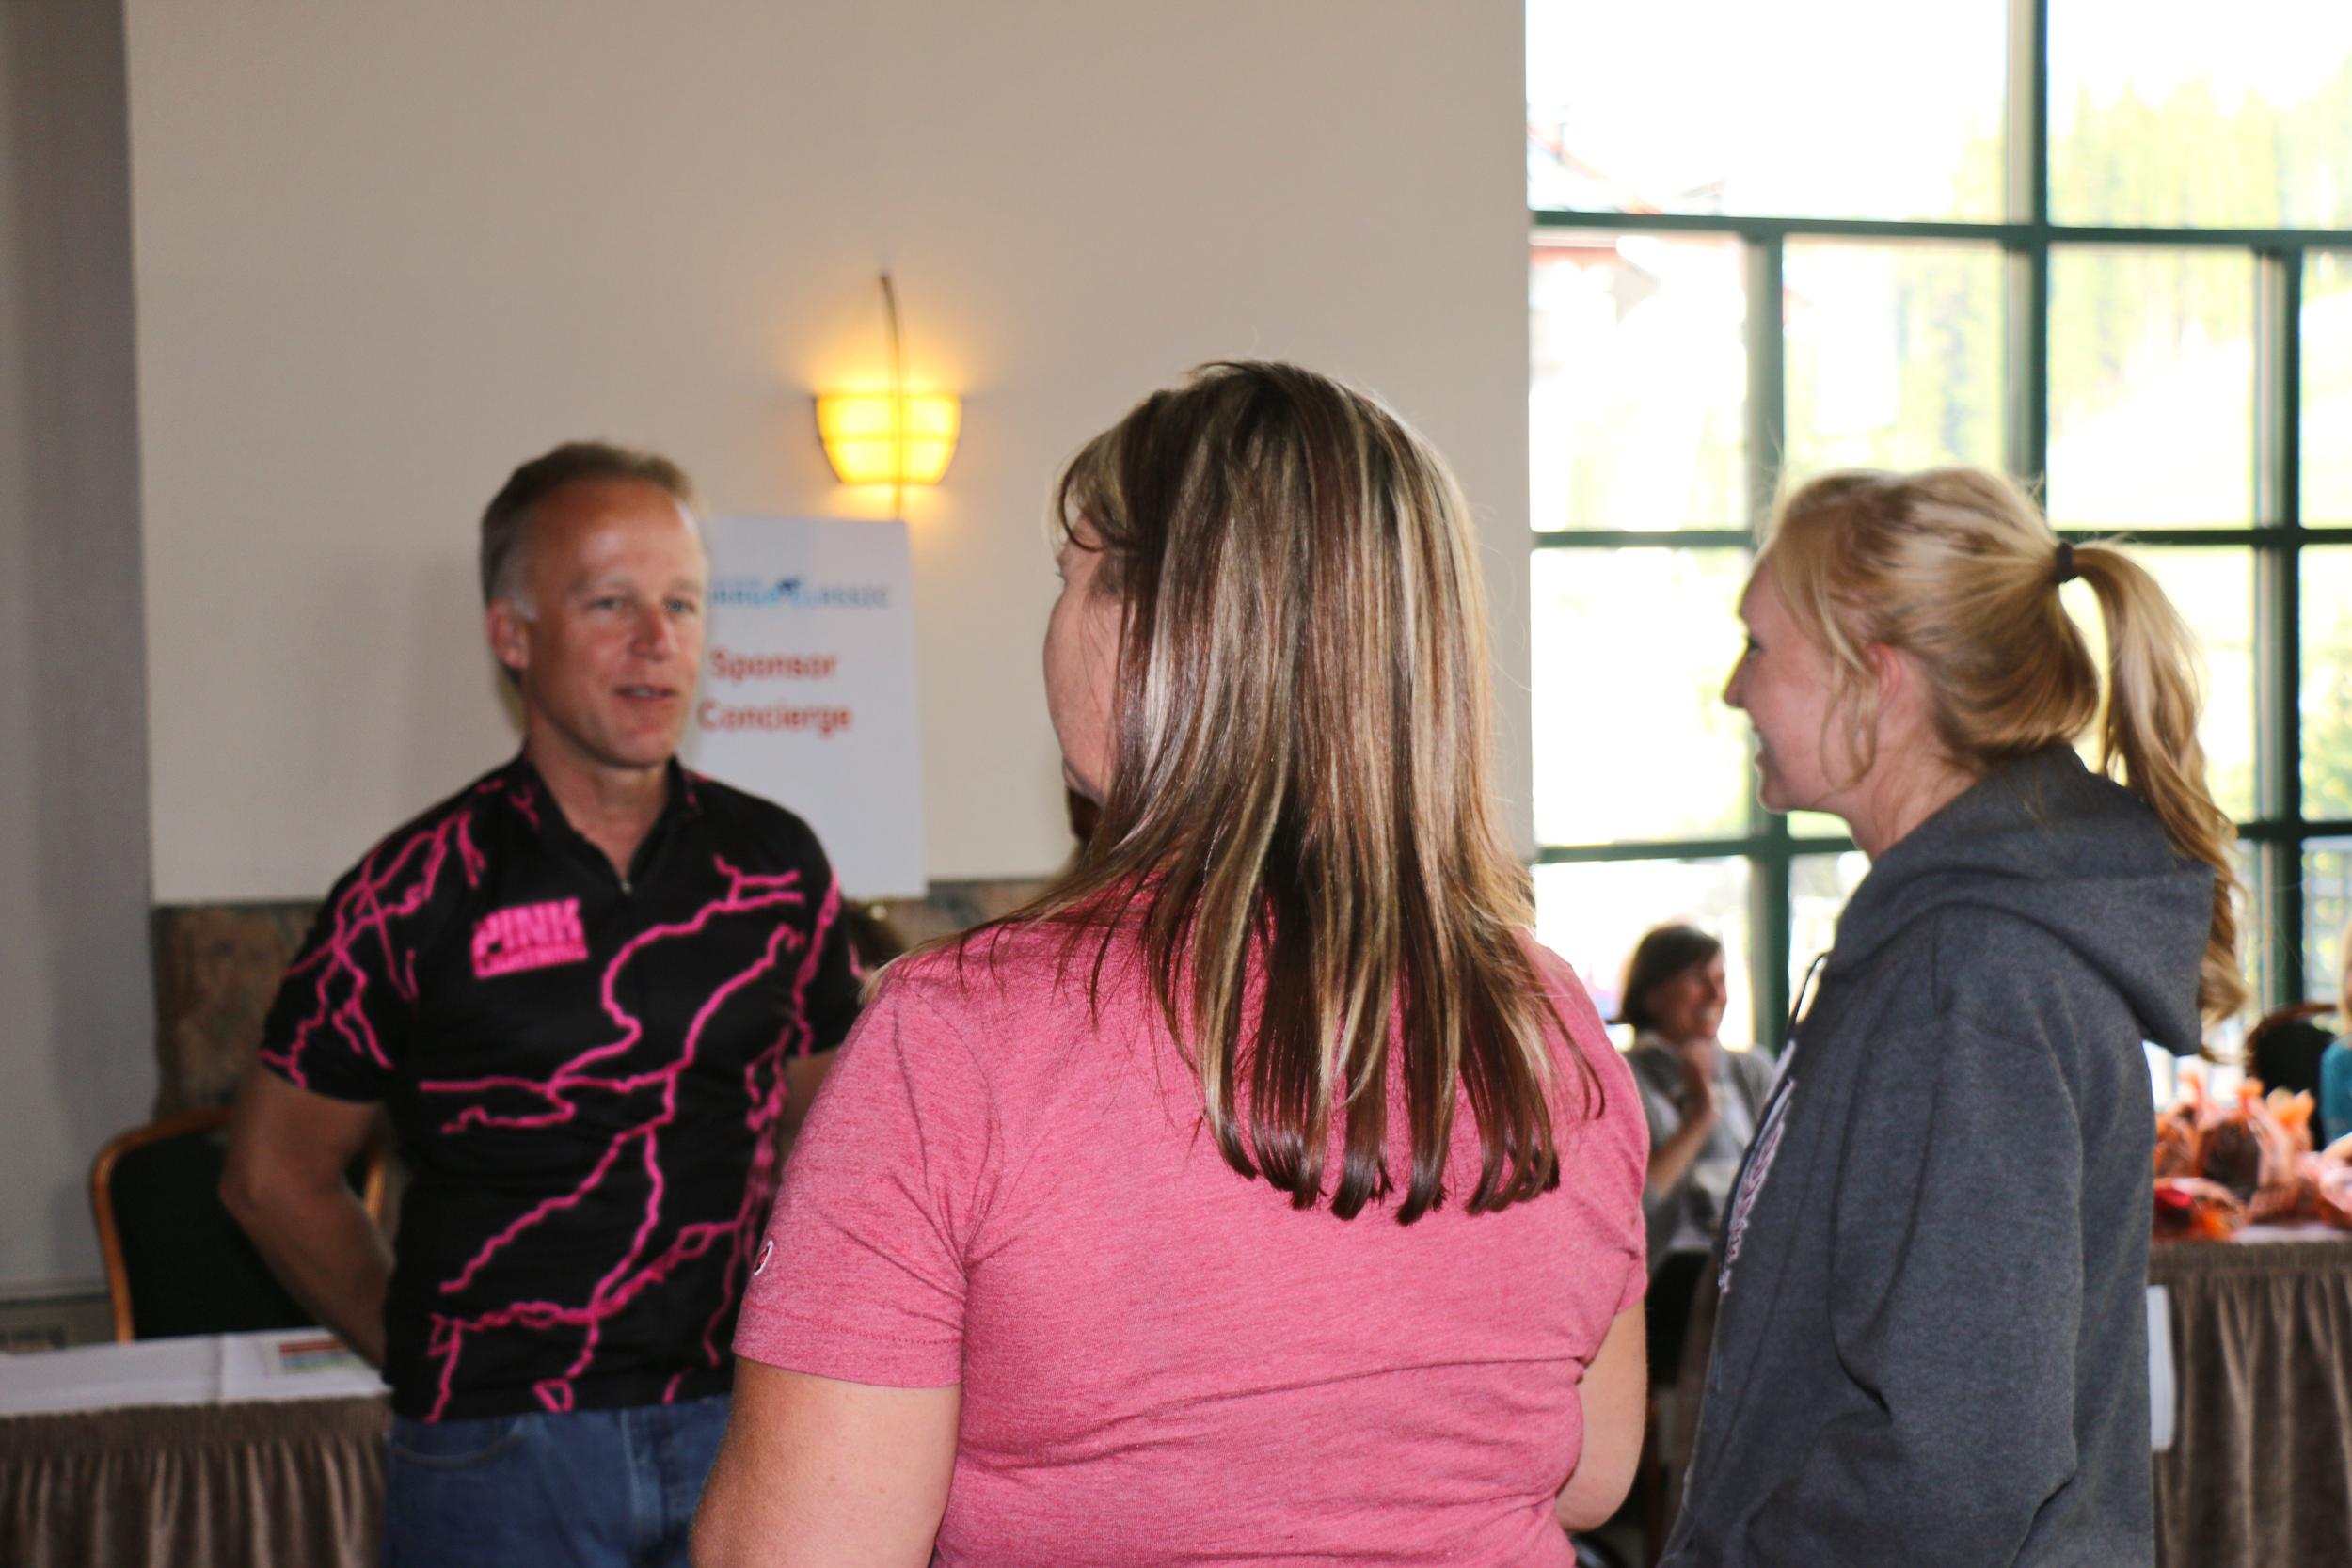 Steve talks to volunteers